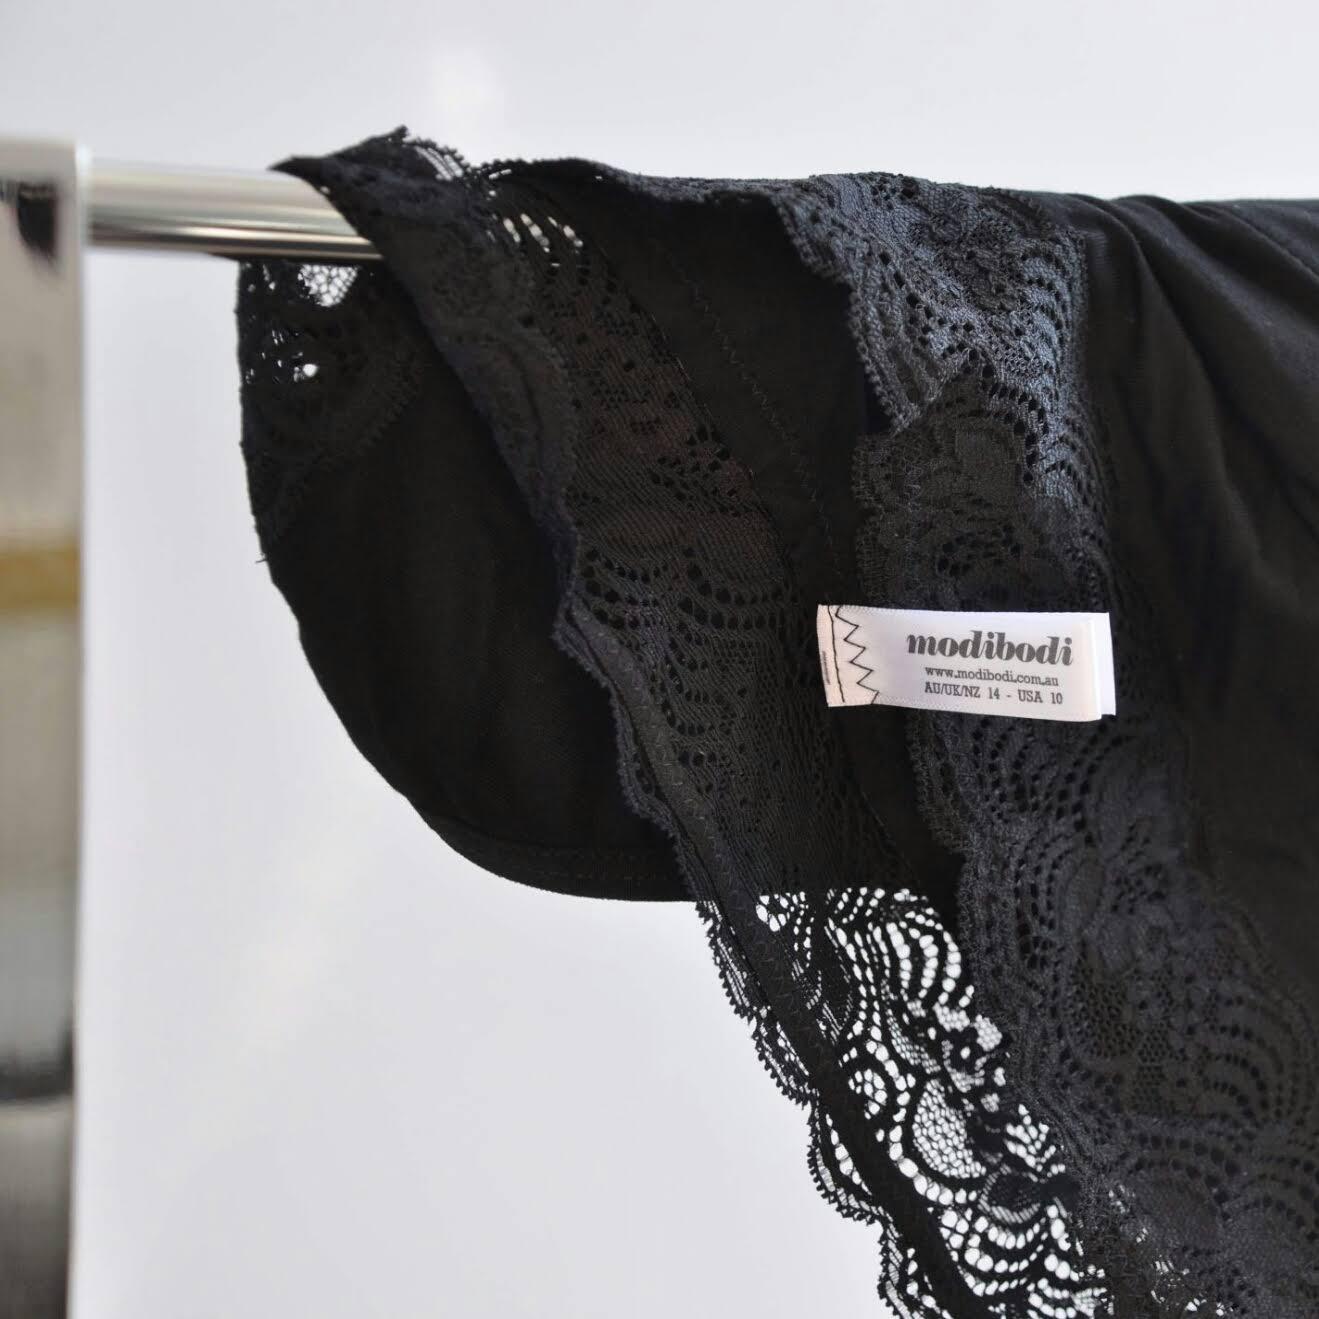 Modibodi Period Underwear